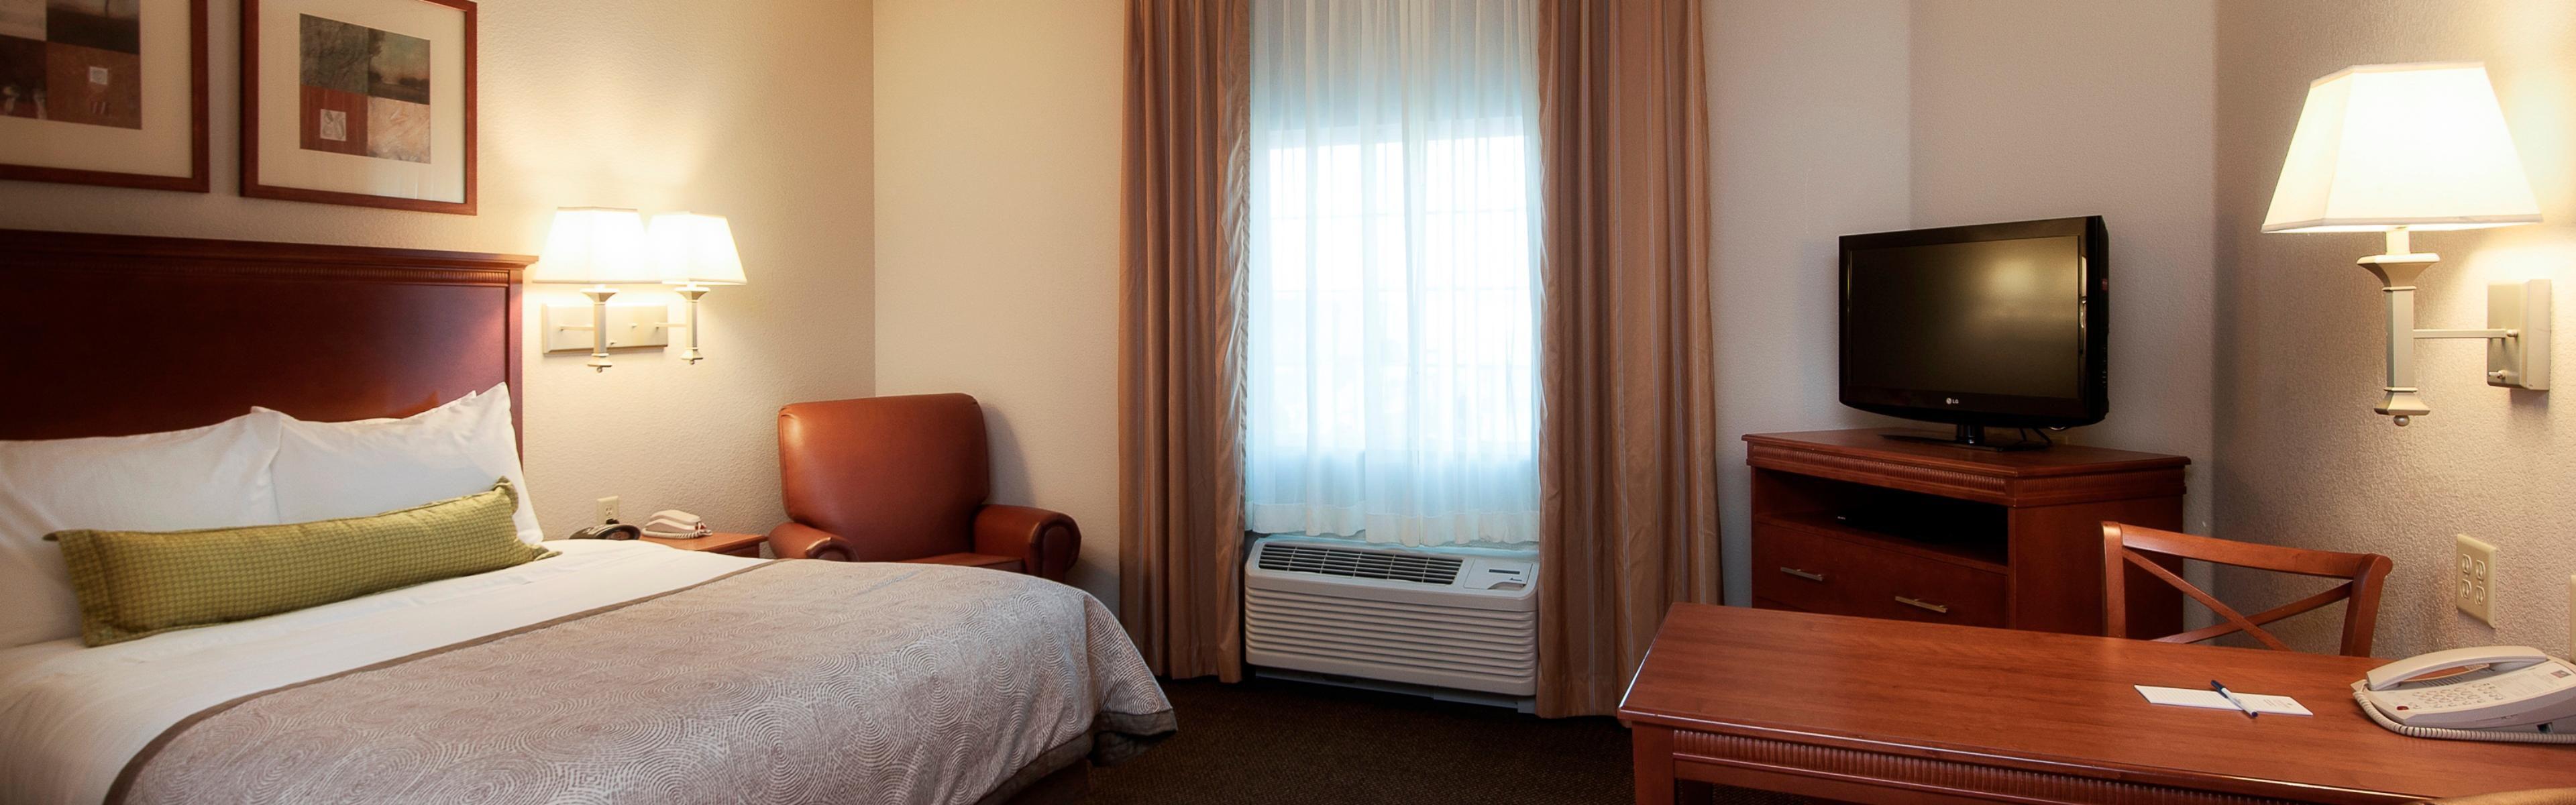 Candlewood Suites Fort Worth/West image 1